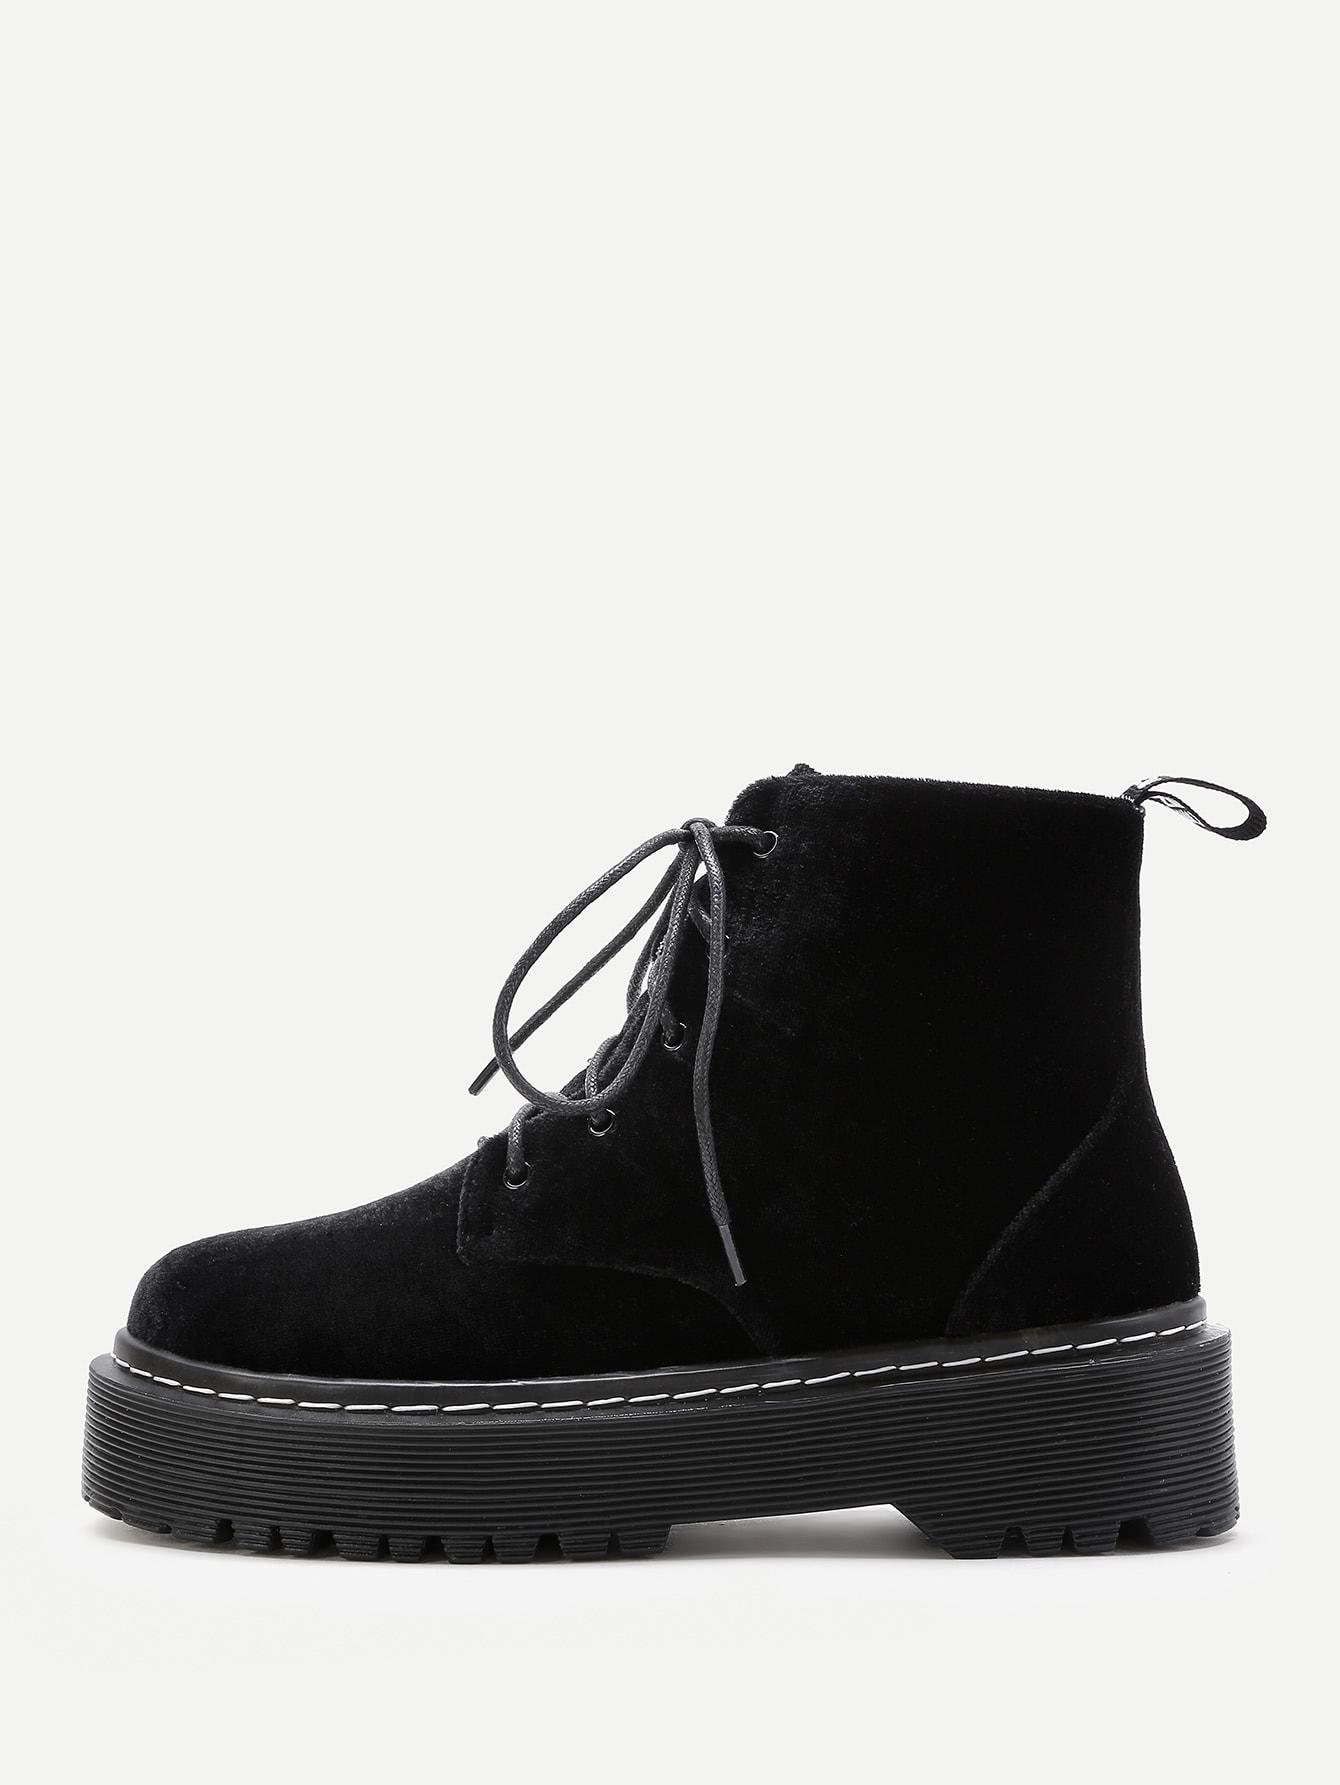 Velvet Lace Up Rubber Sole Ankle Boots